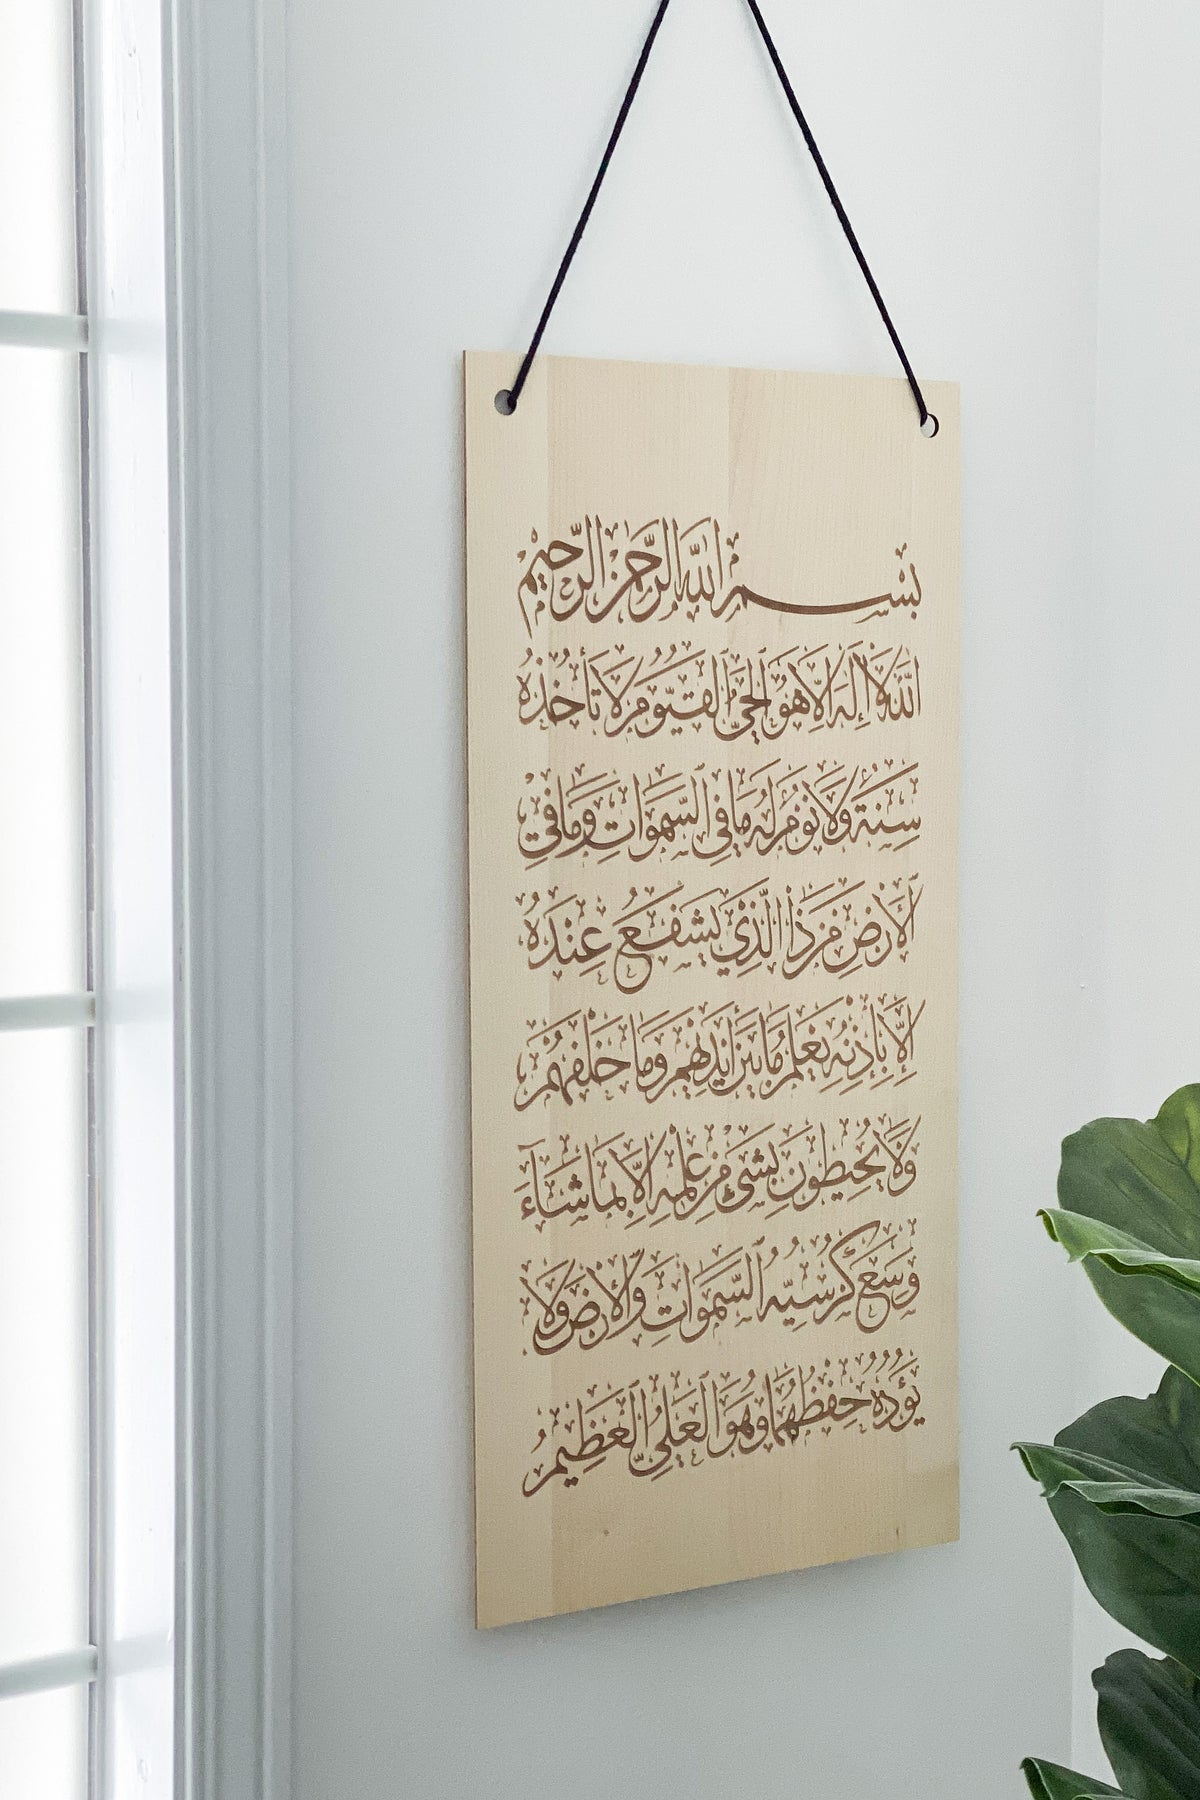 Image of hanging Ayatul Kursi